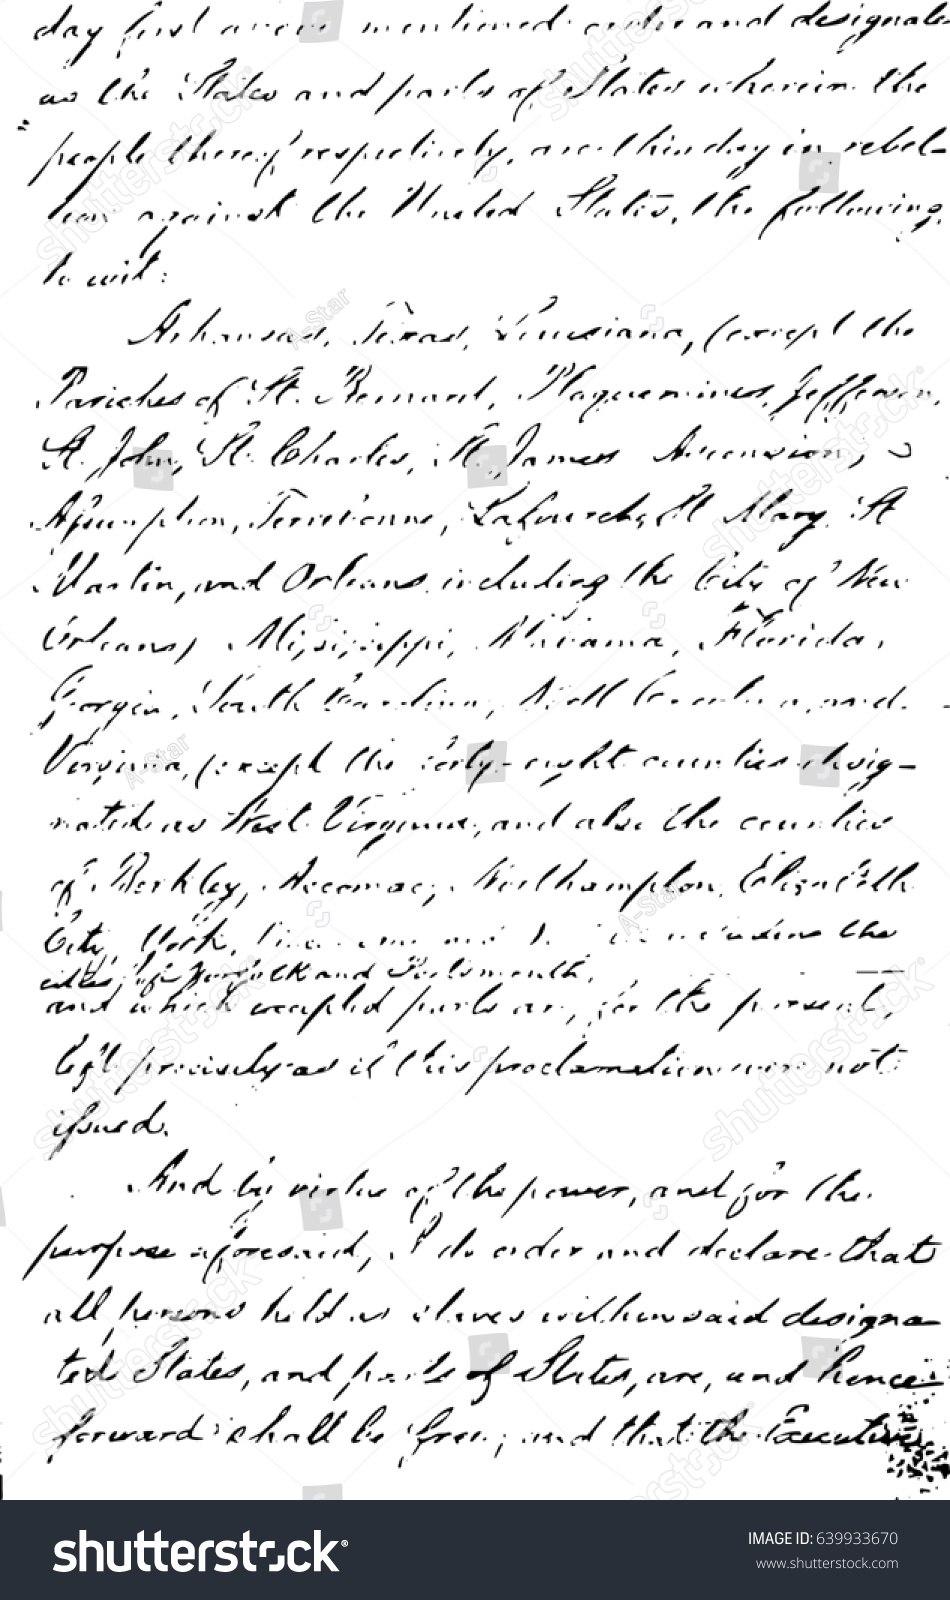 Vintage Handwriting Template Old Letter Texture Stock Illustration Regarding Olden Day Letter Template